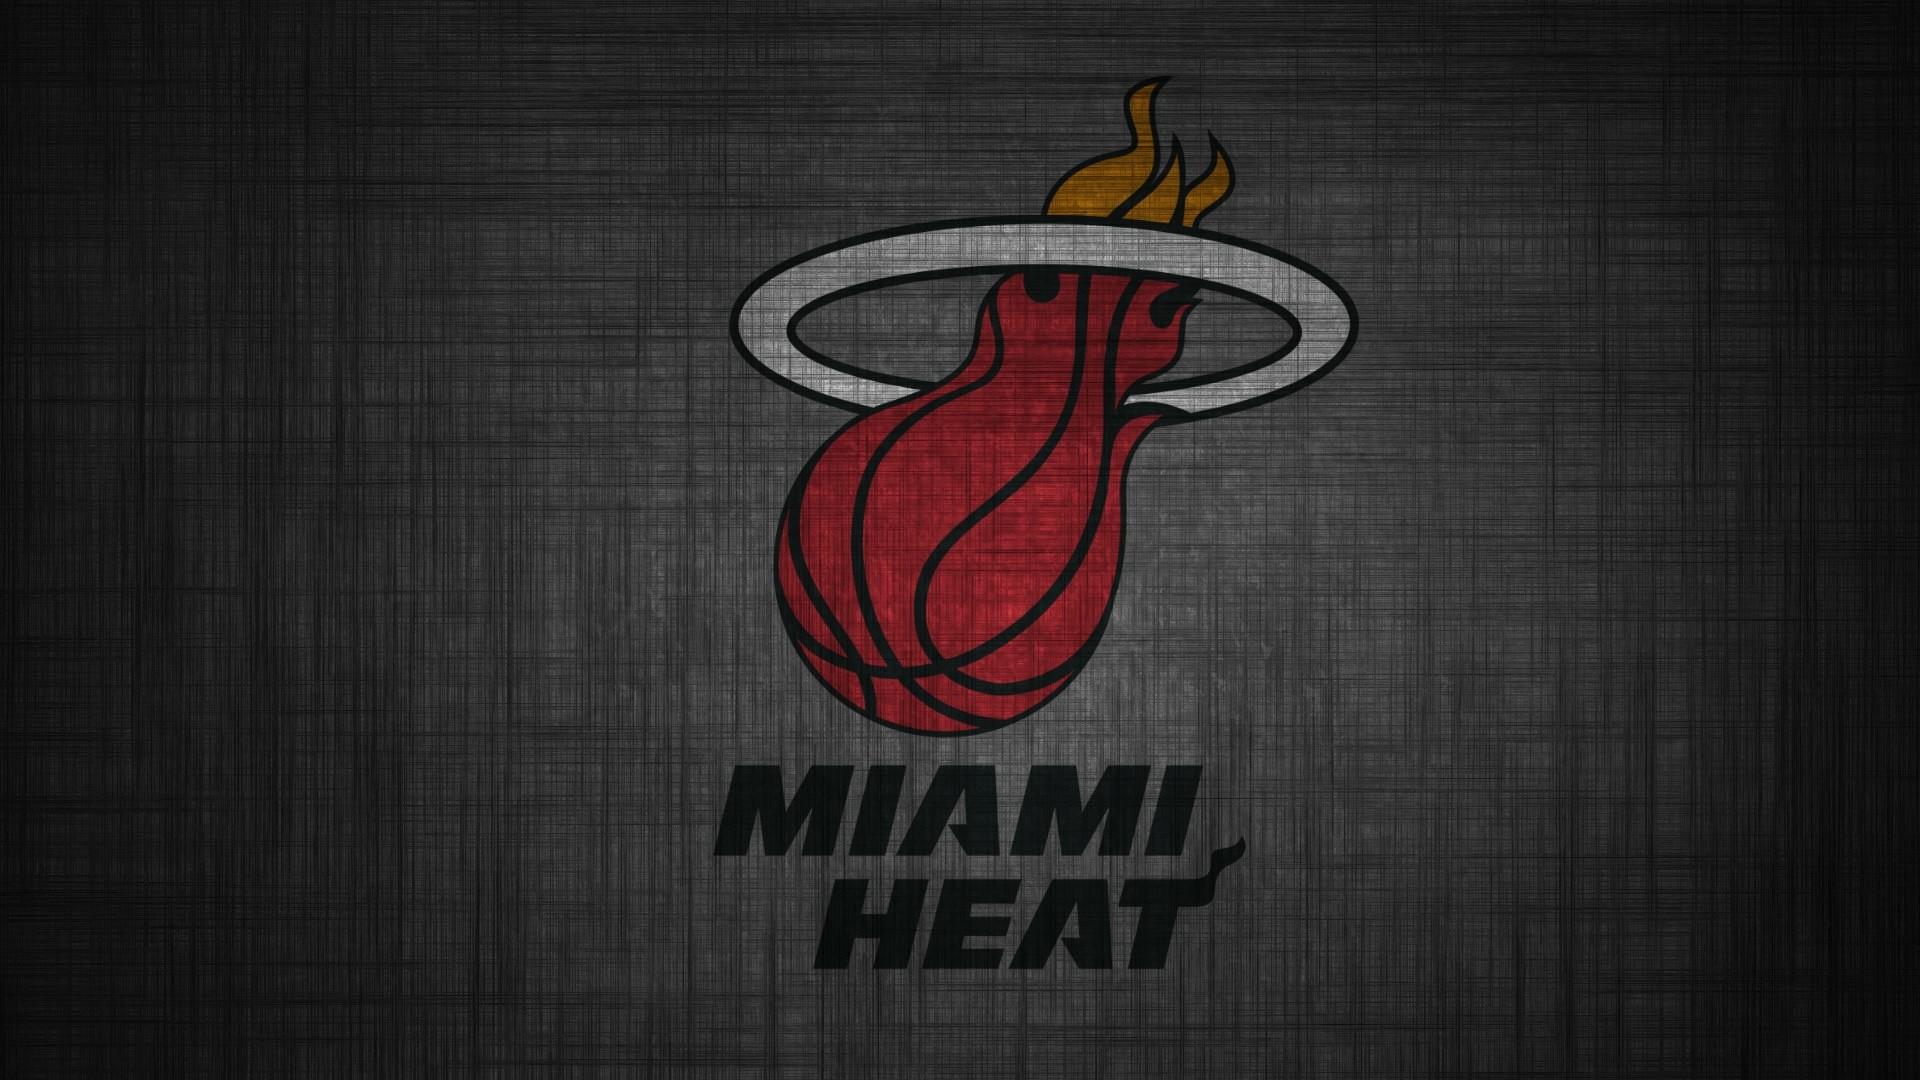 Miami Heat Wallpaper Hd 66 Pictures